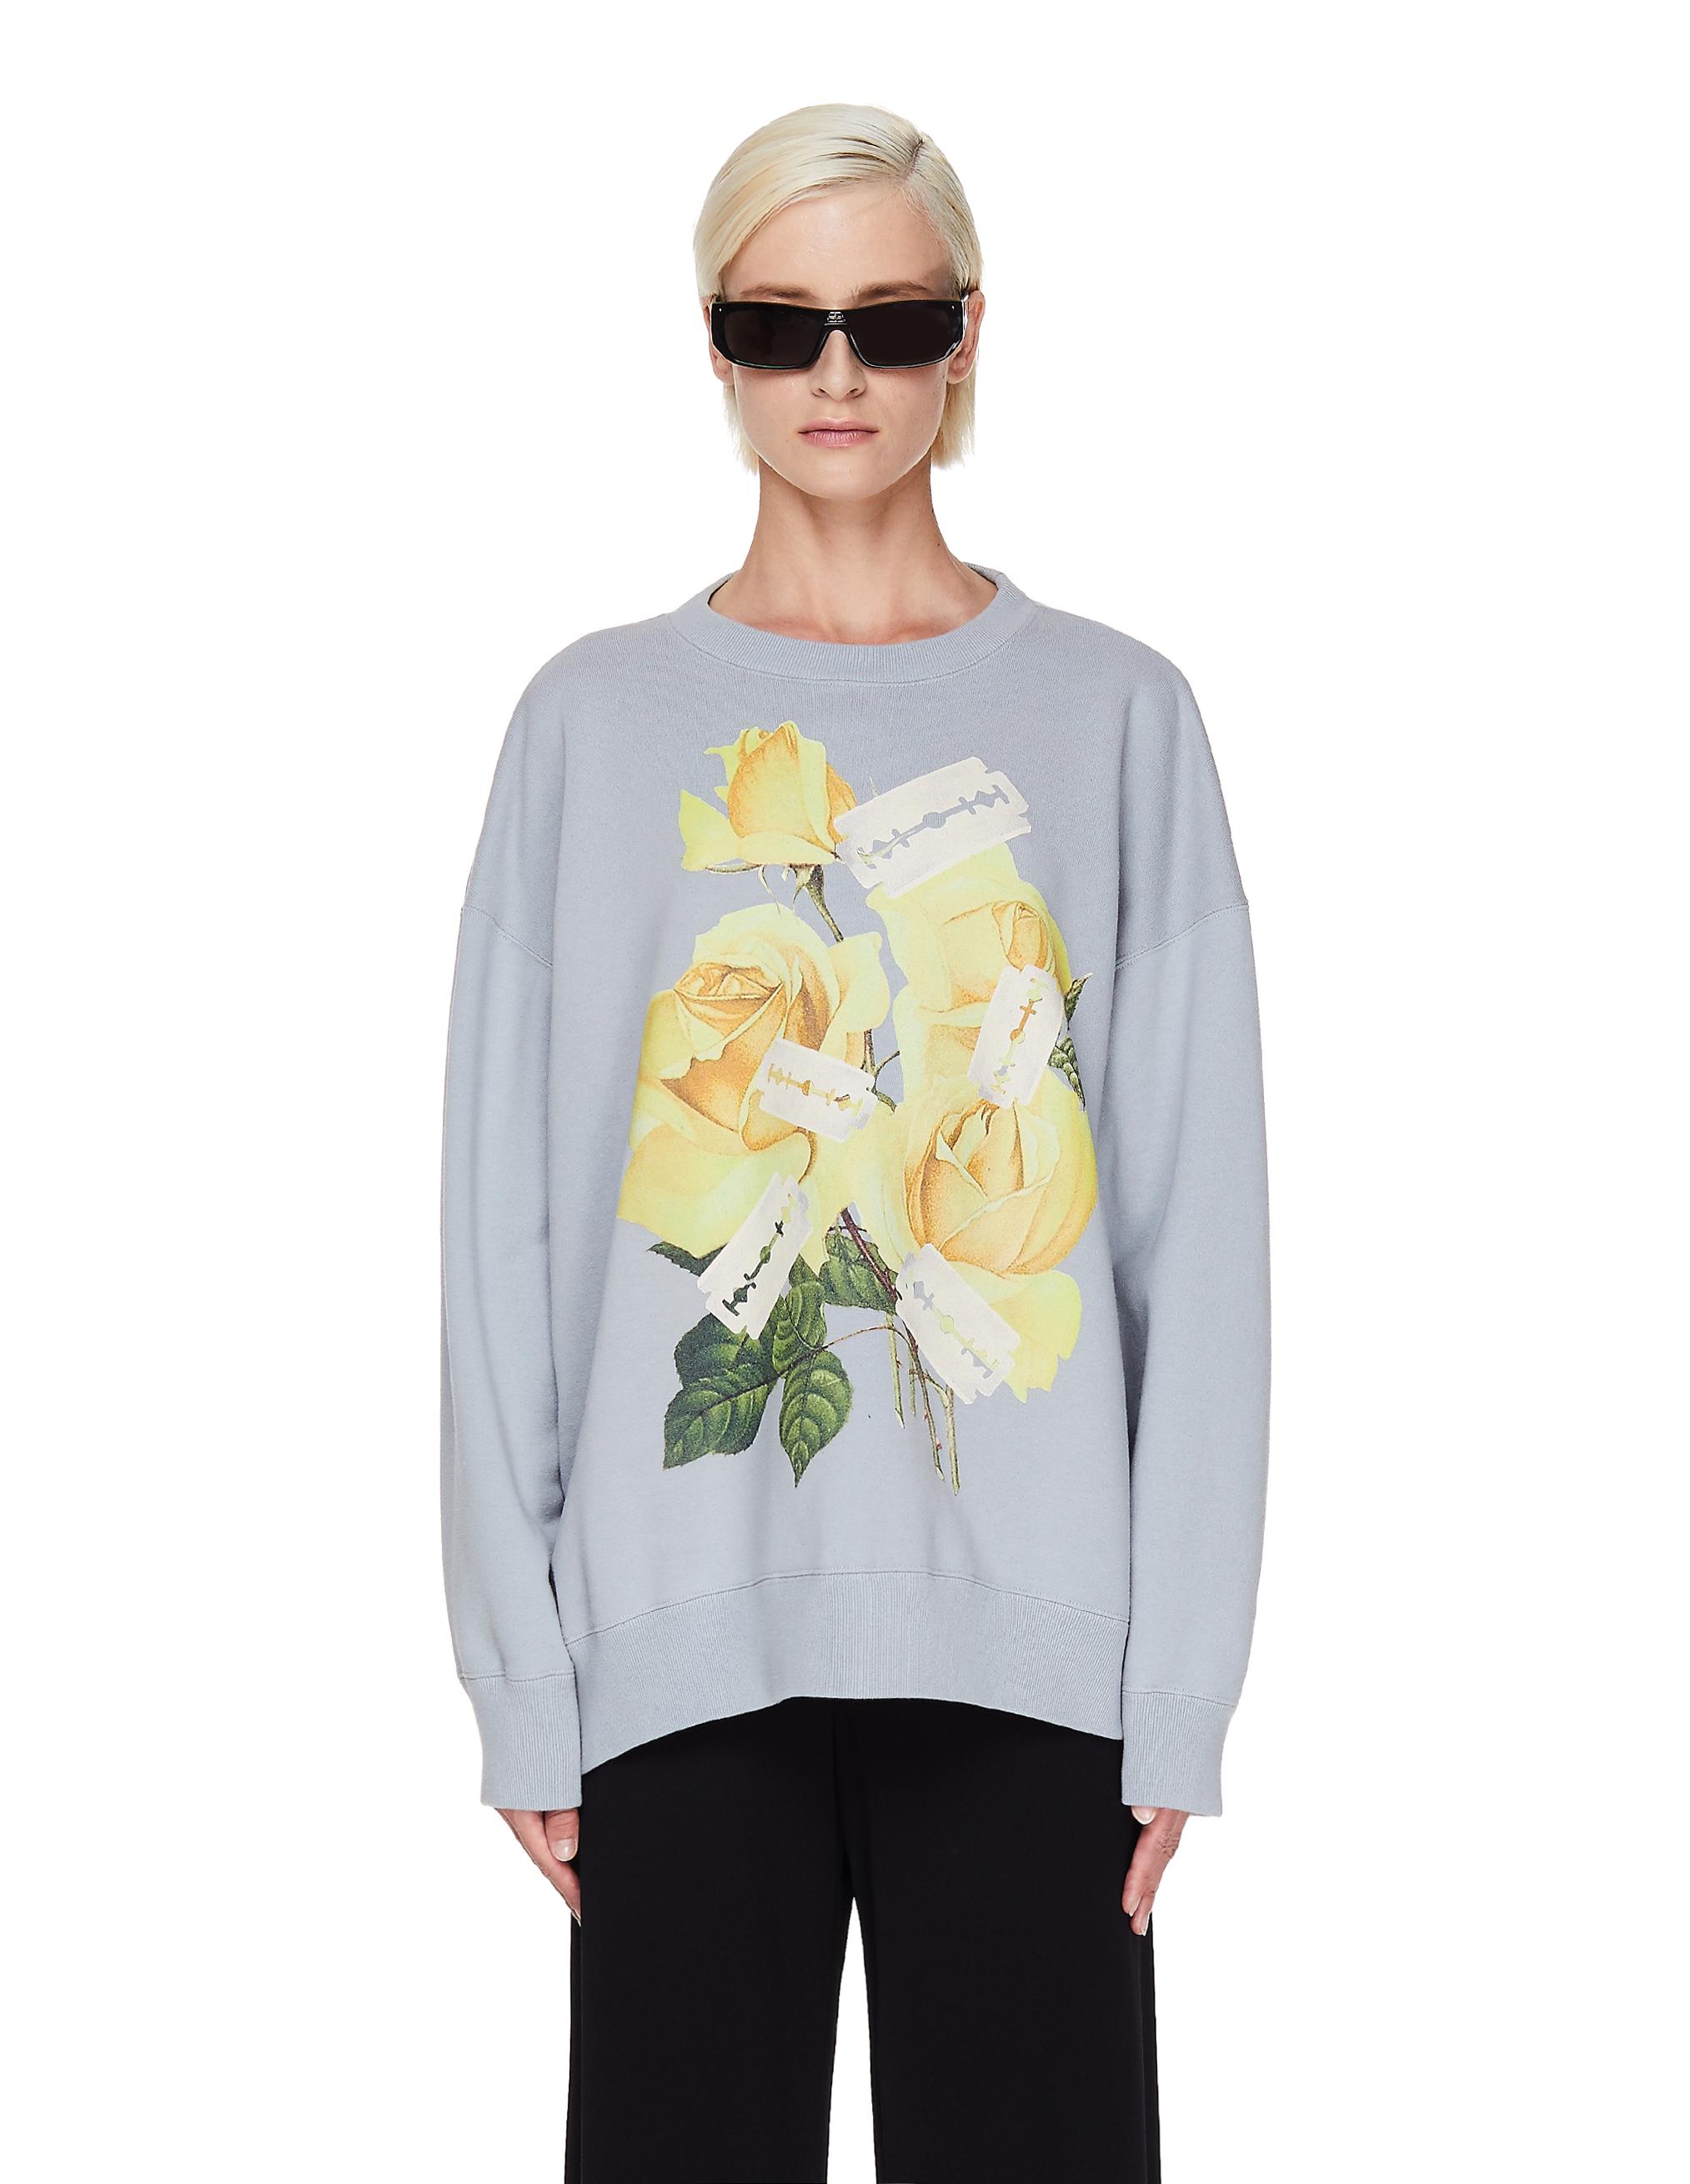 Undercover Grey Cotton Printed Sweatshirt